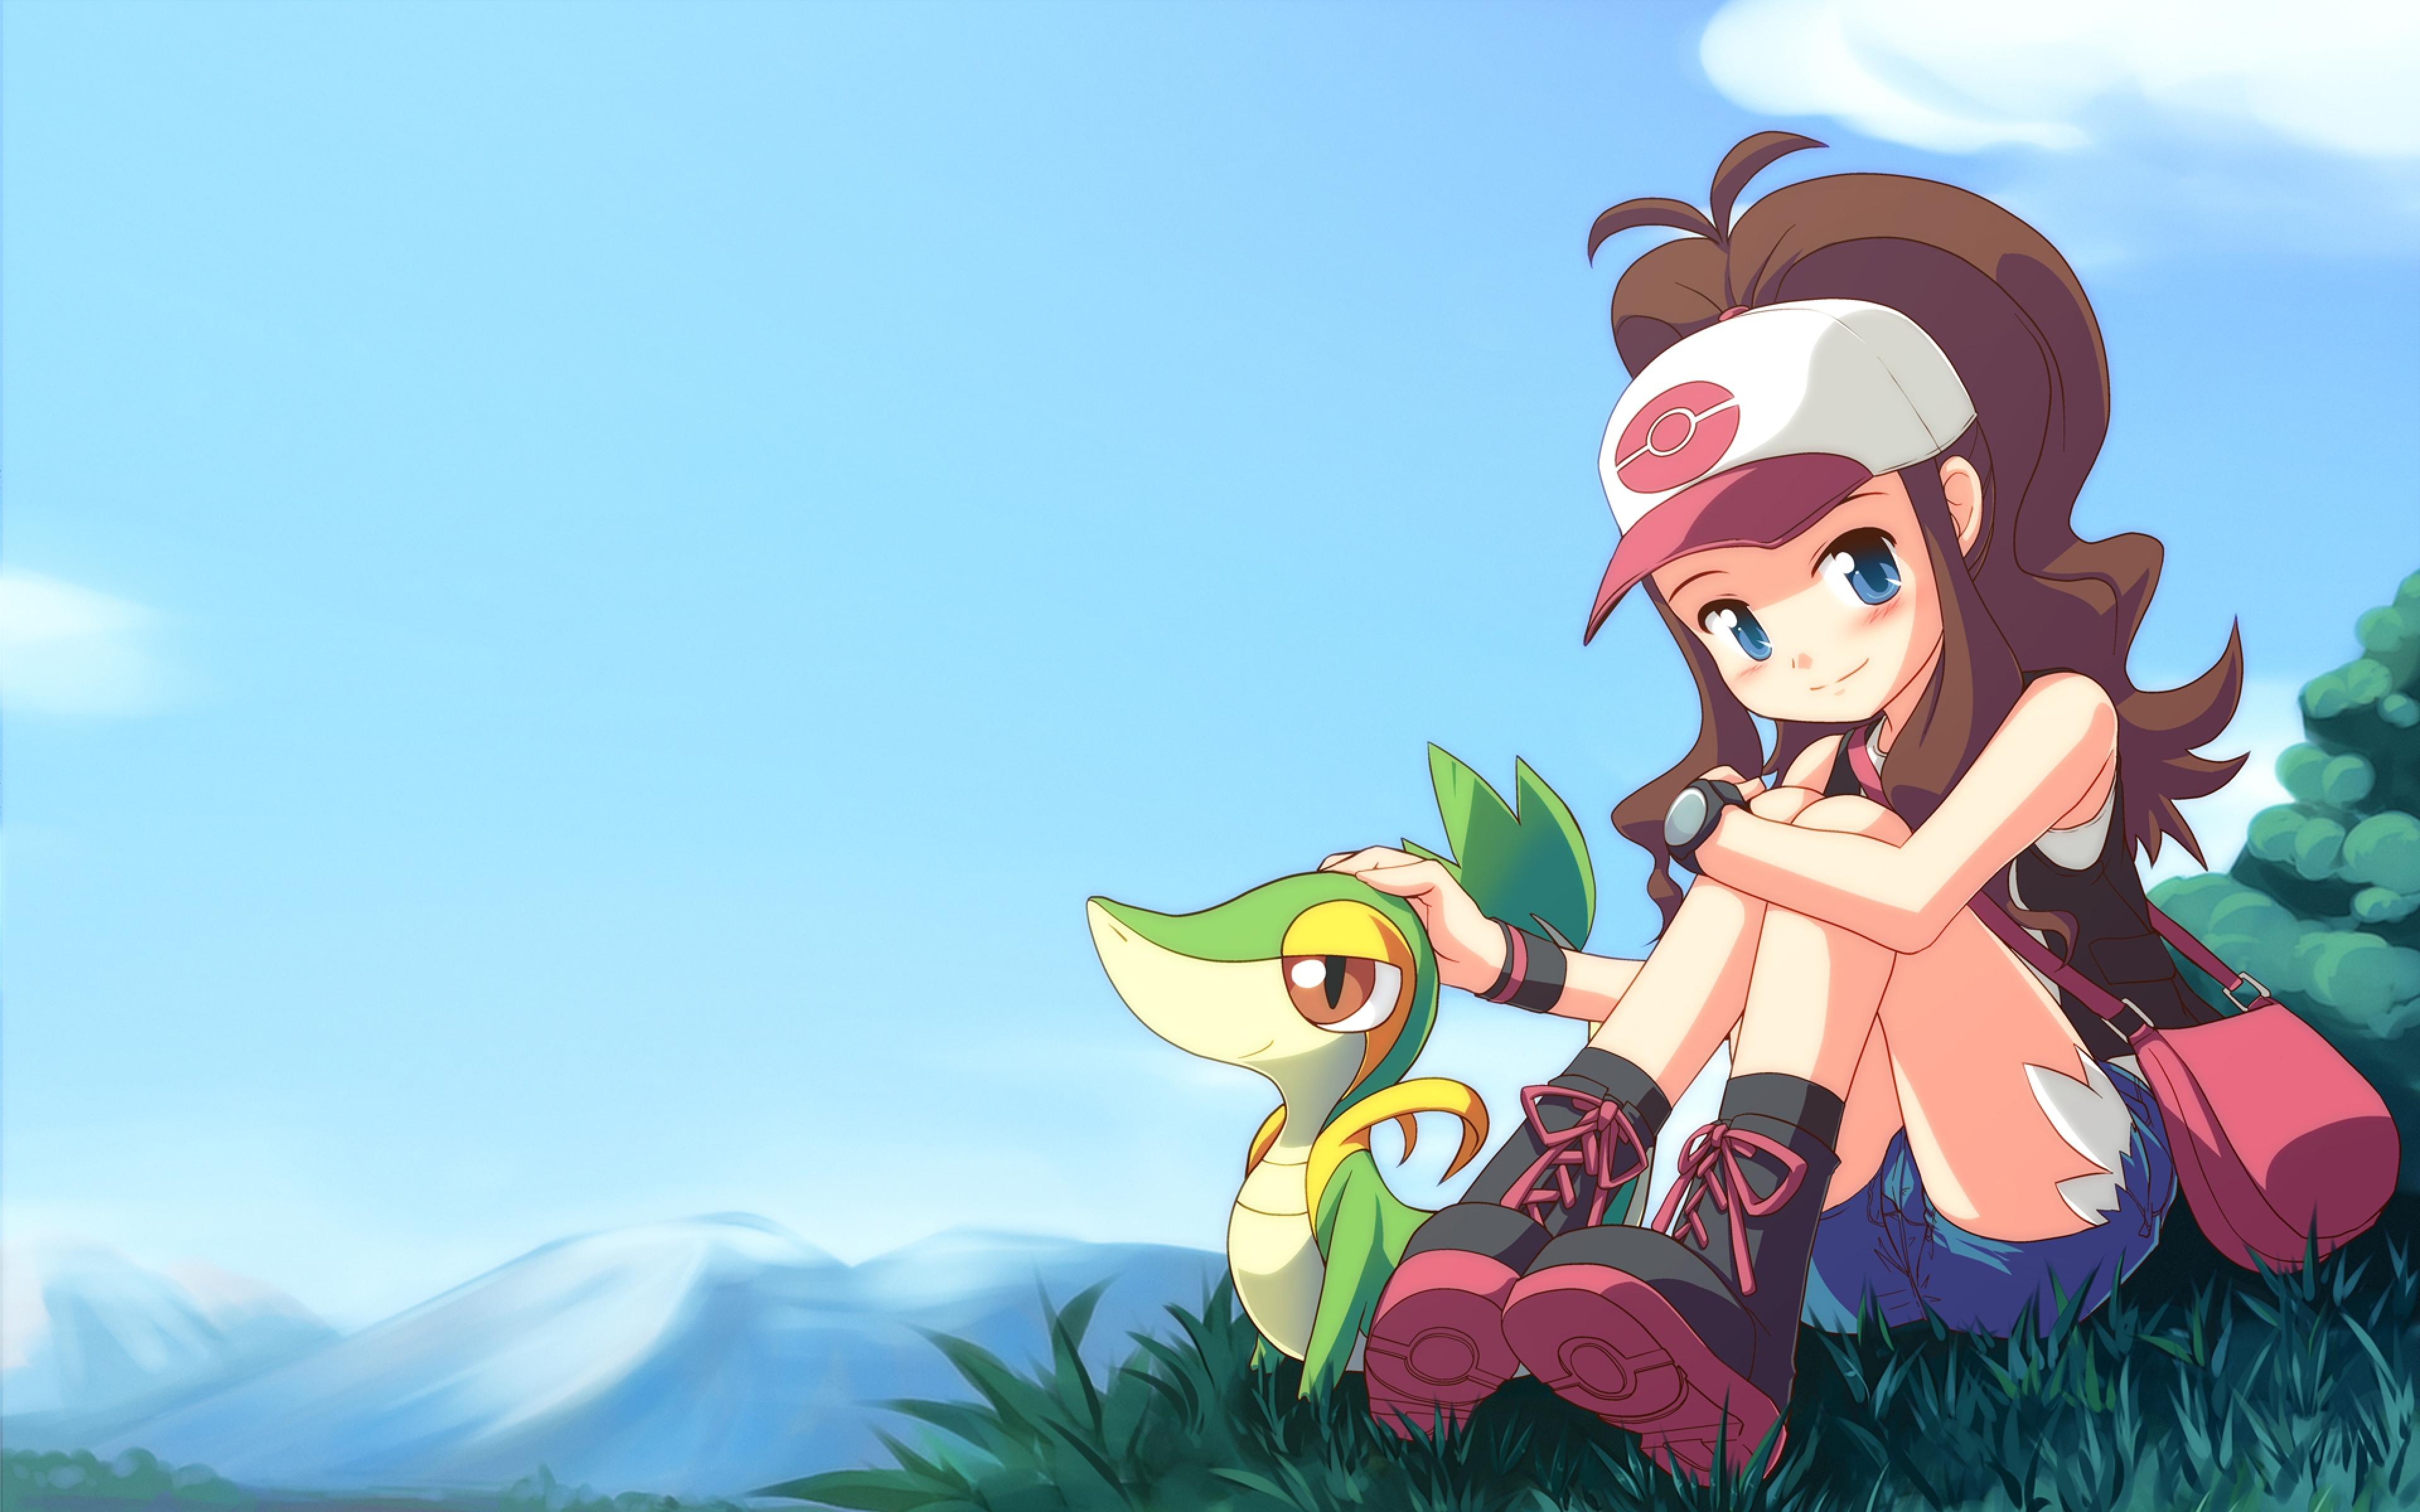 Download Wallpaper 3840x2400 Pocket monster Pokemon Girl Hat Being 3840x2400